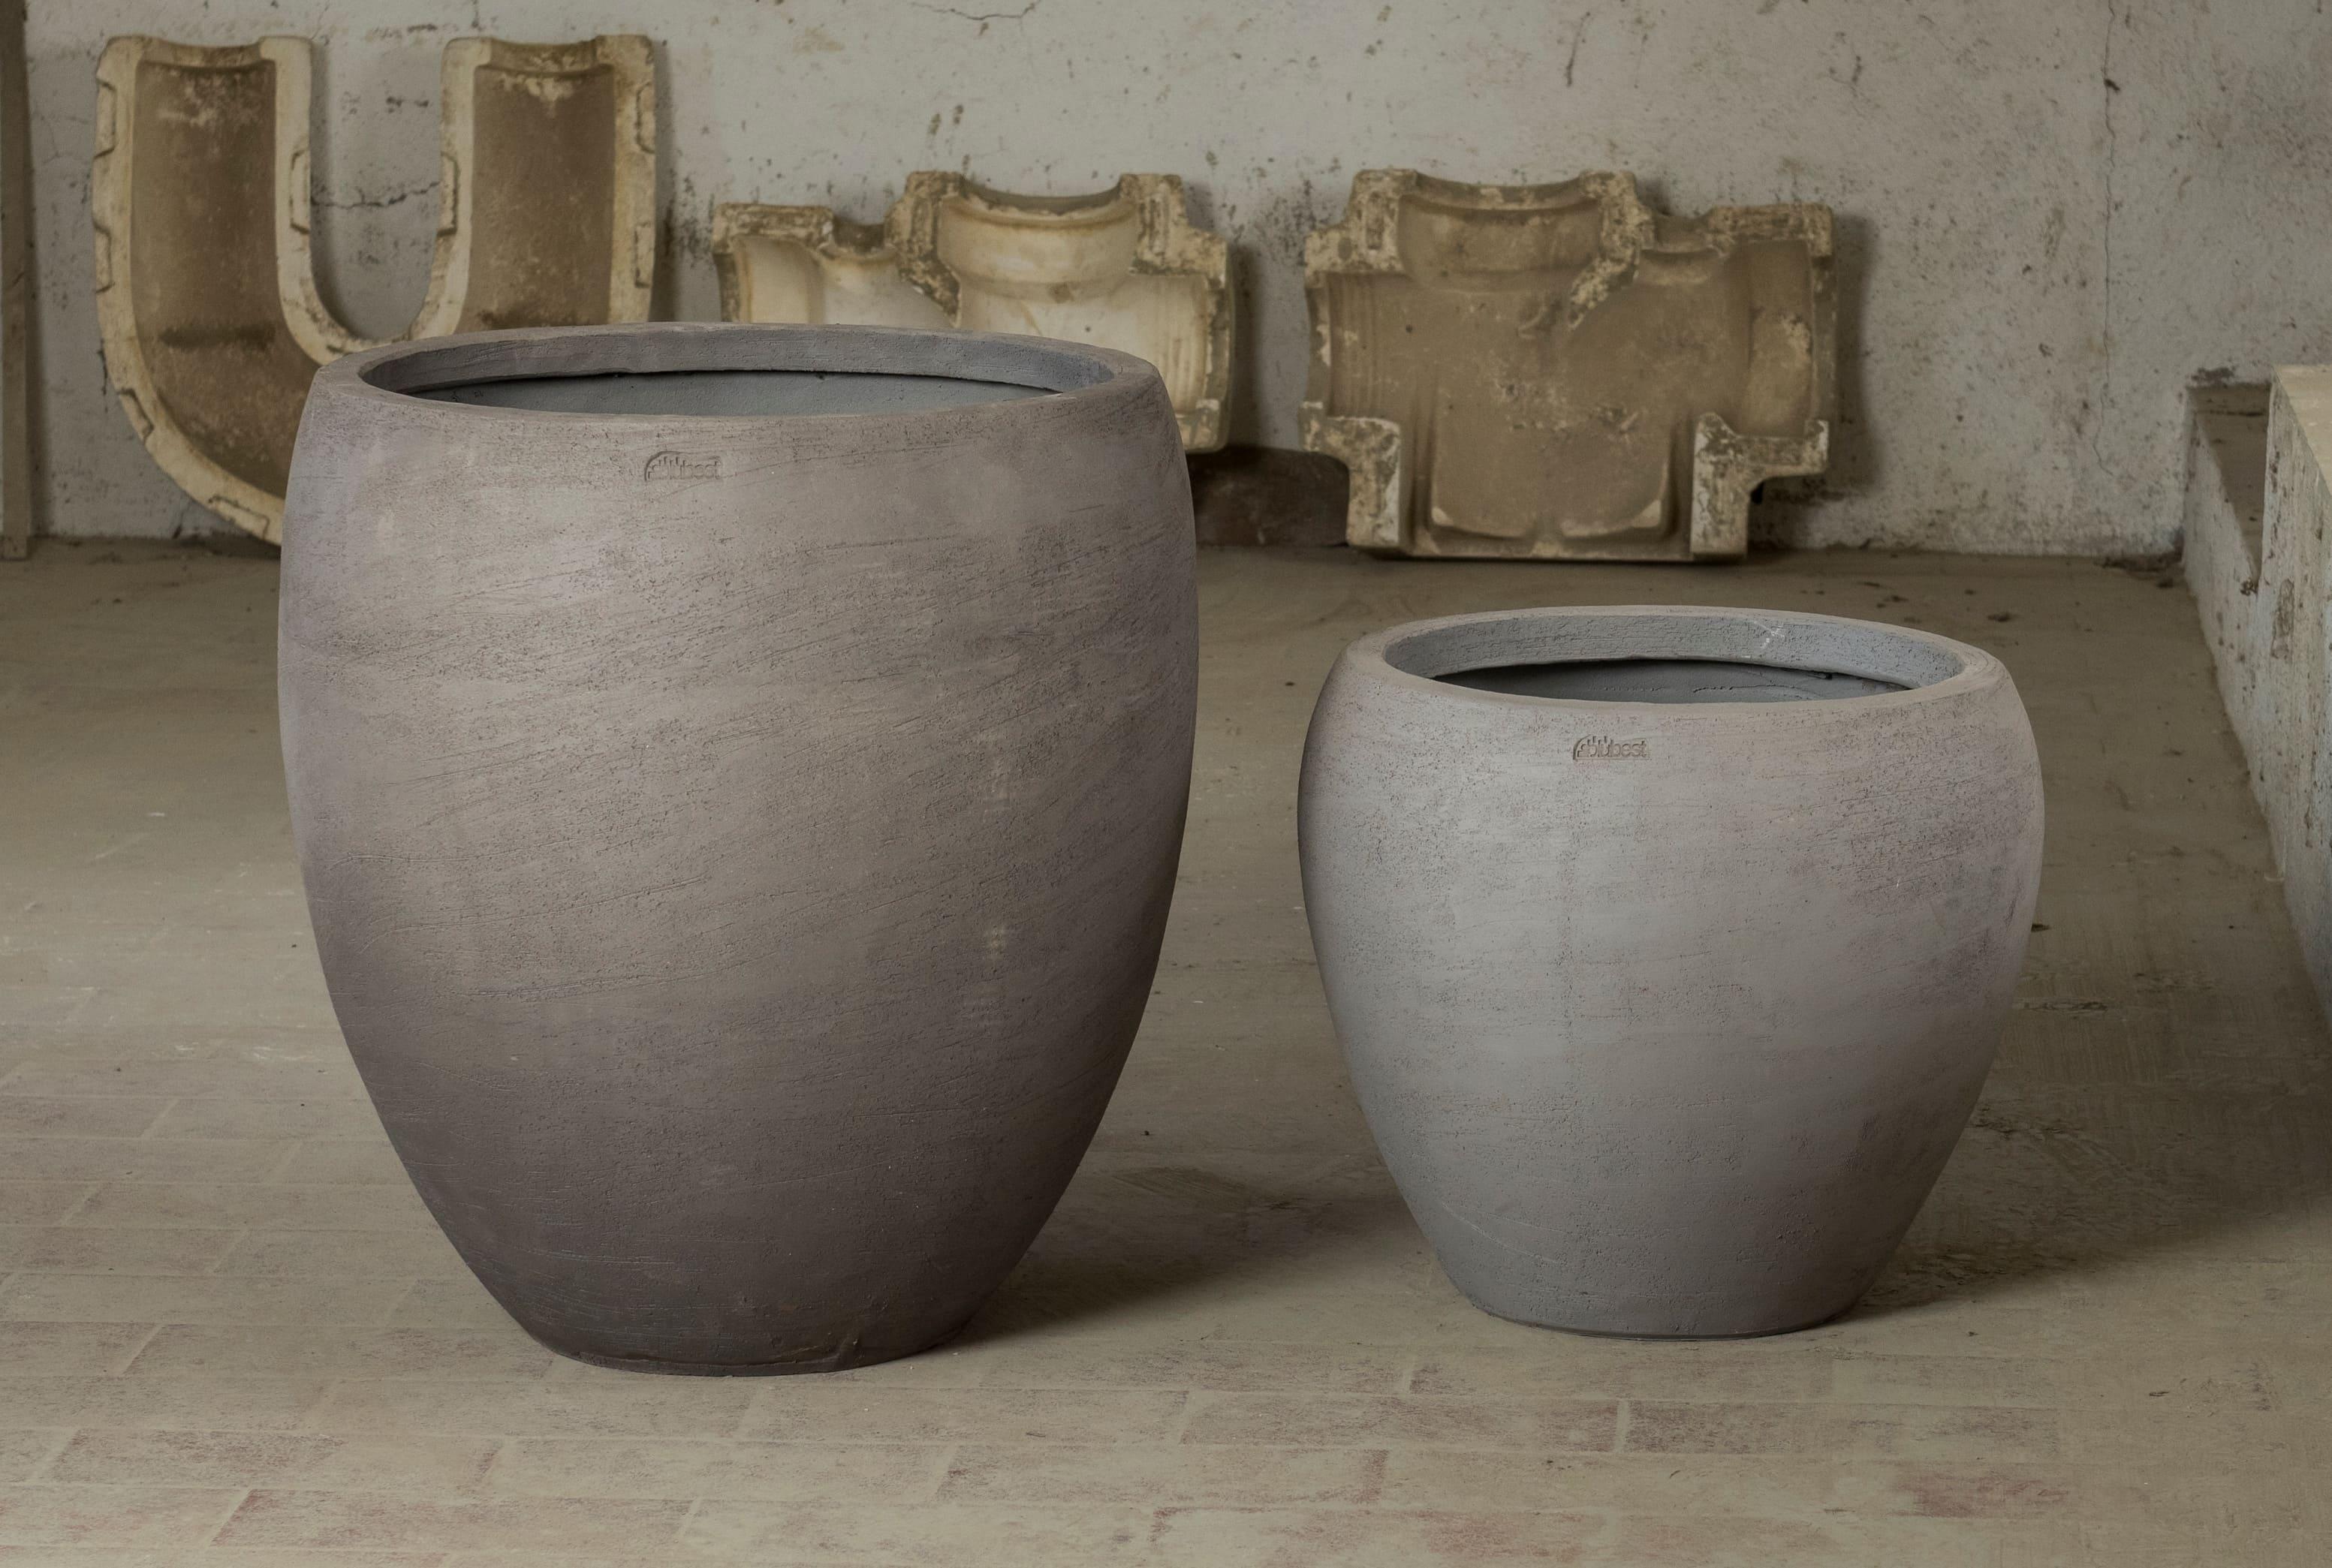 SB Tondo Liscio vaso in terracotta